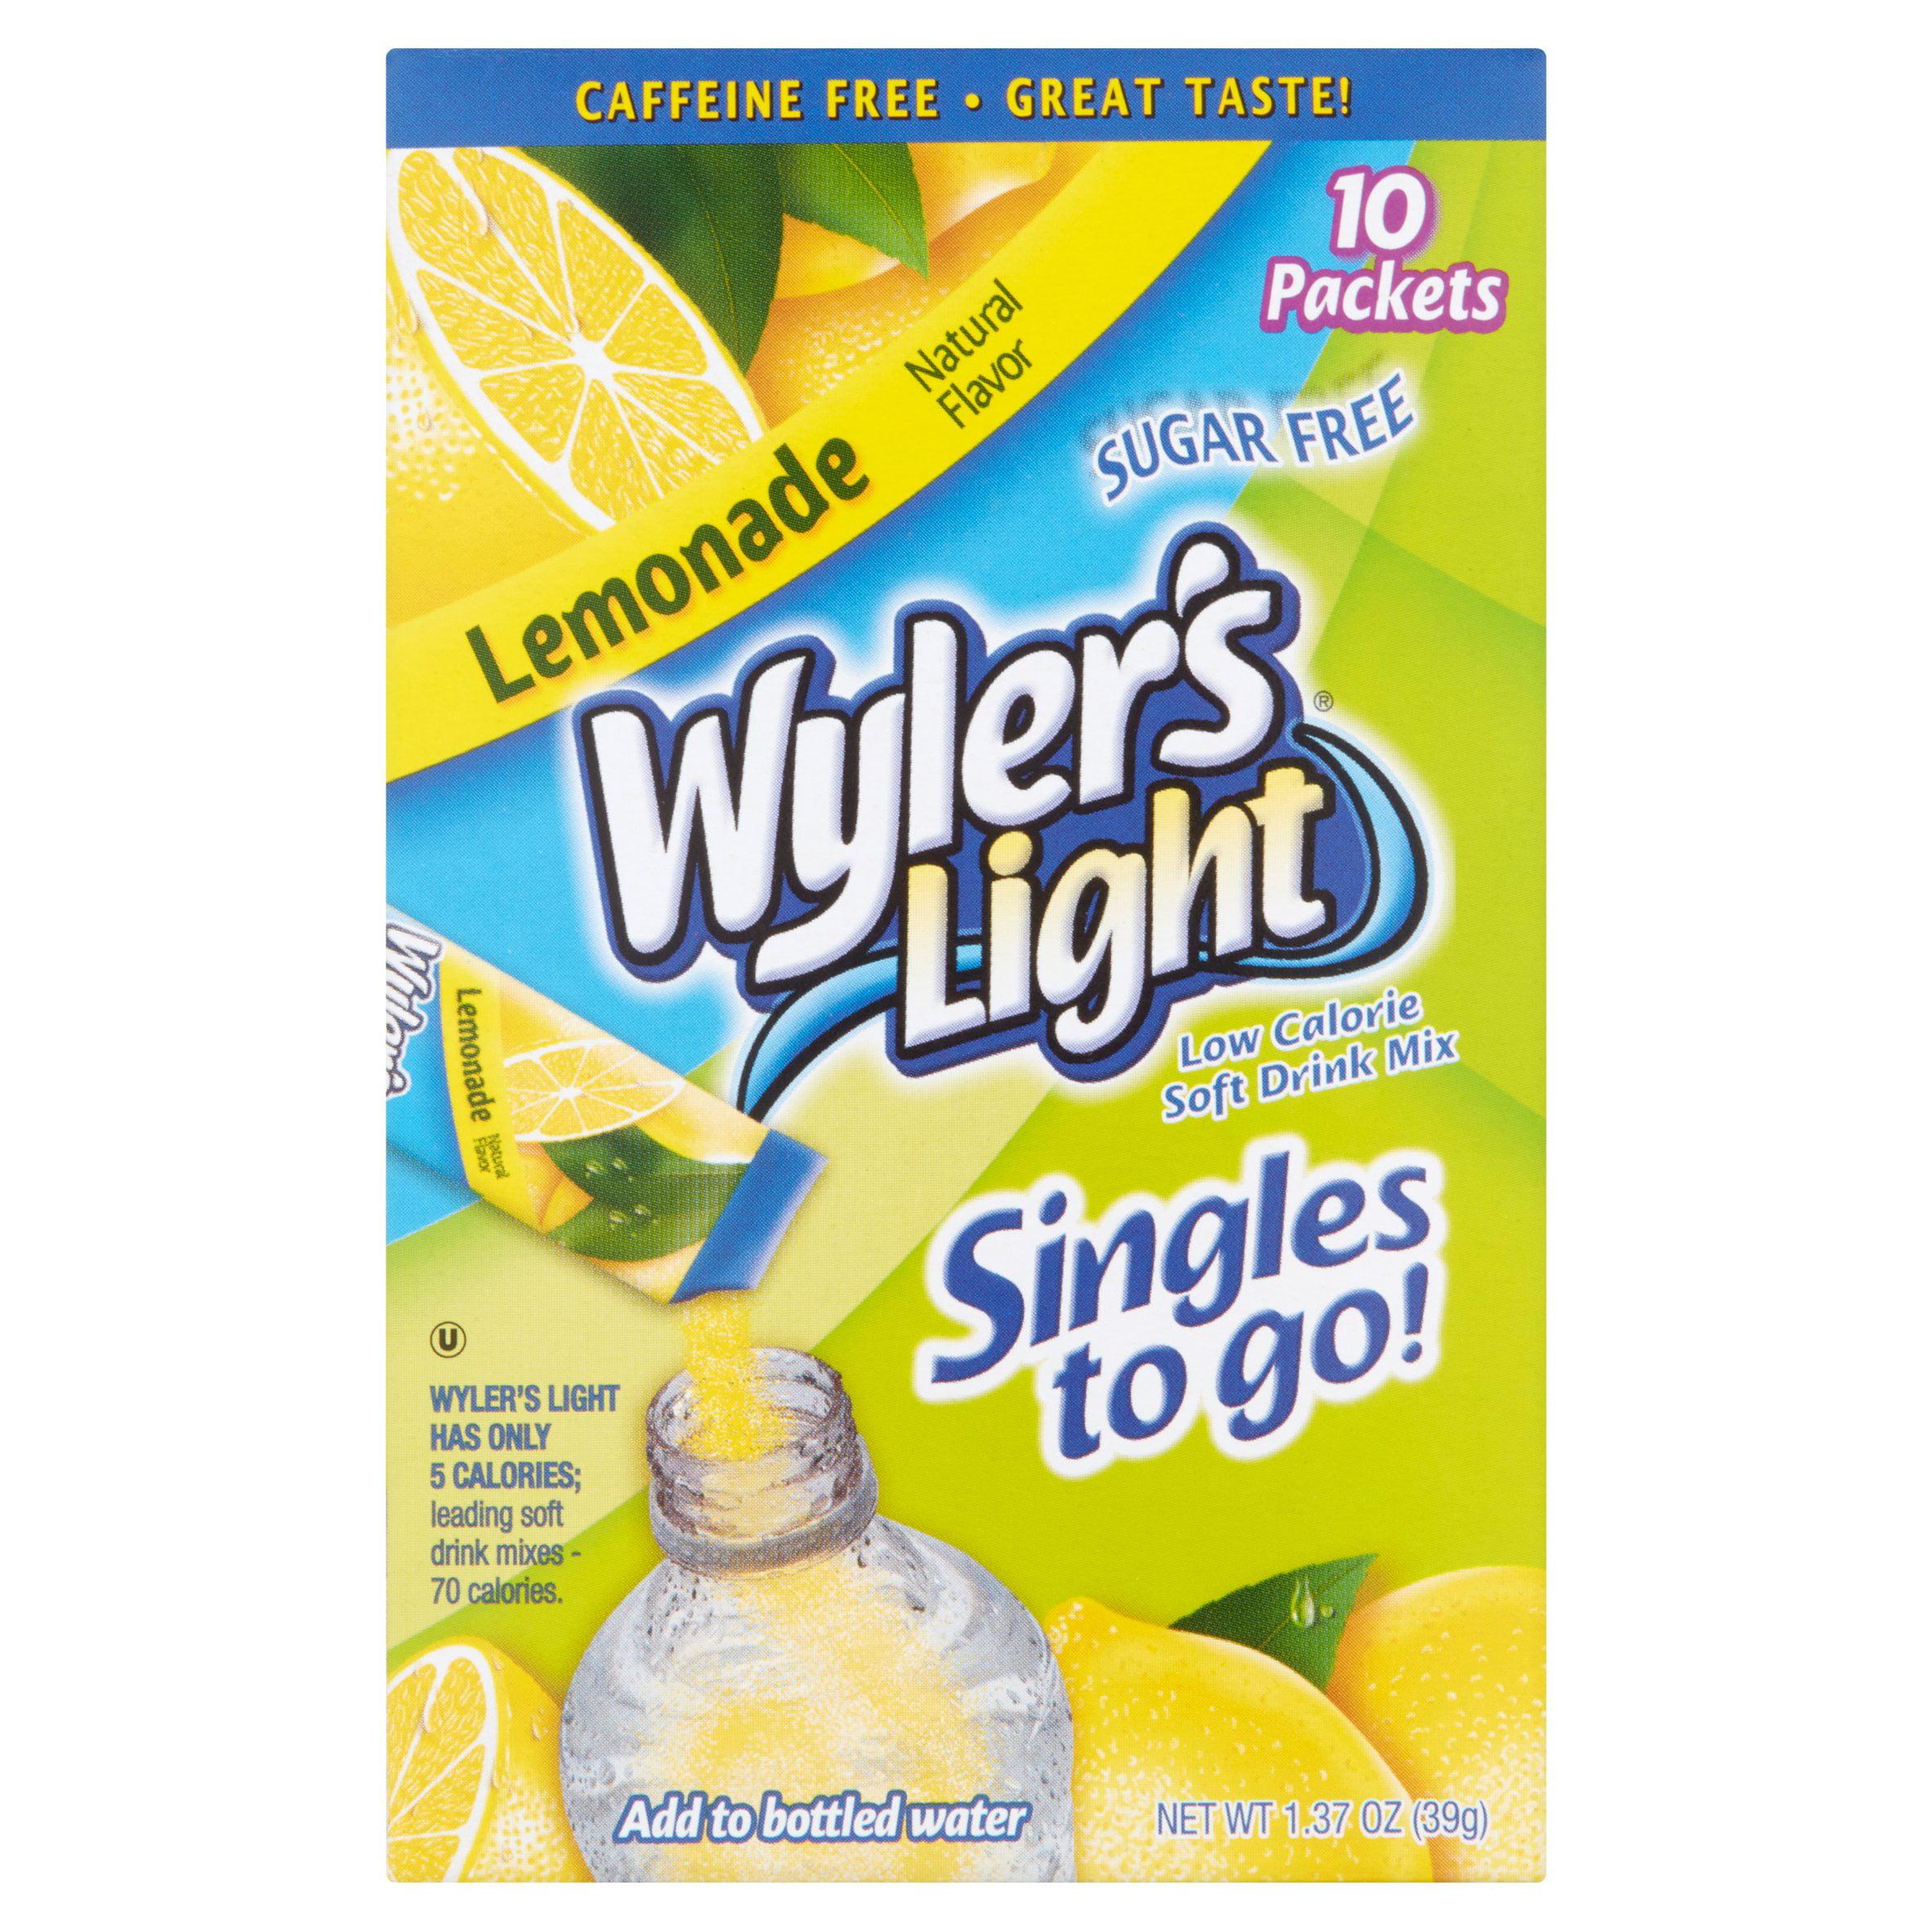 Wyler's Light Lemonade Drink Mix Sticks, 10 count, 1.36 oz